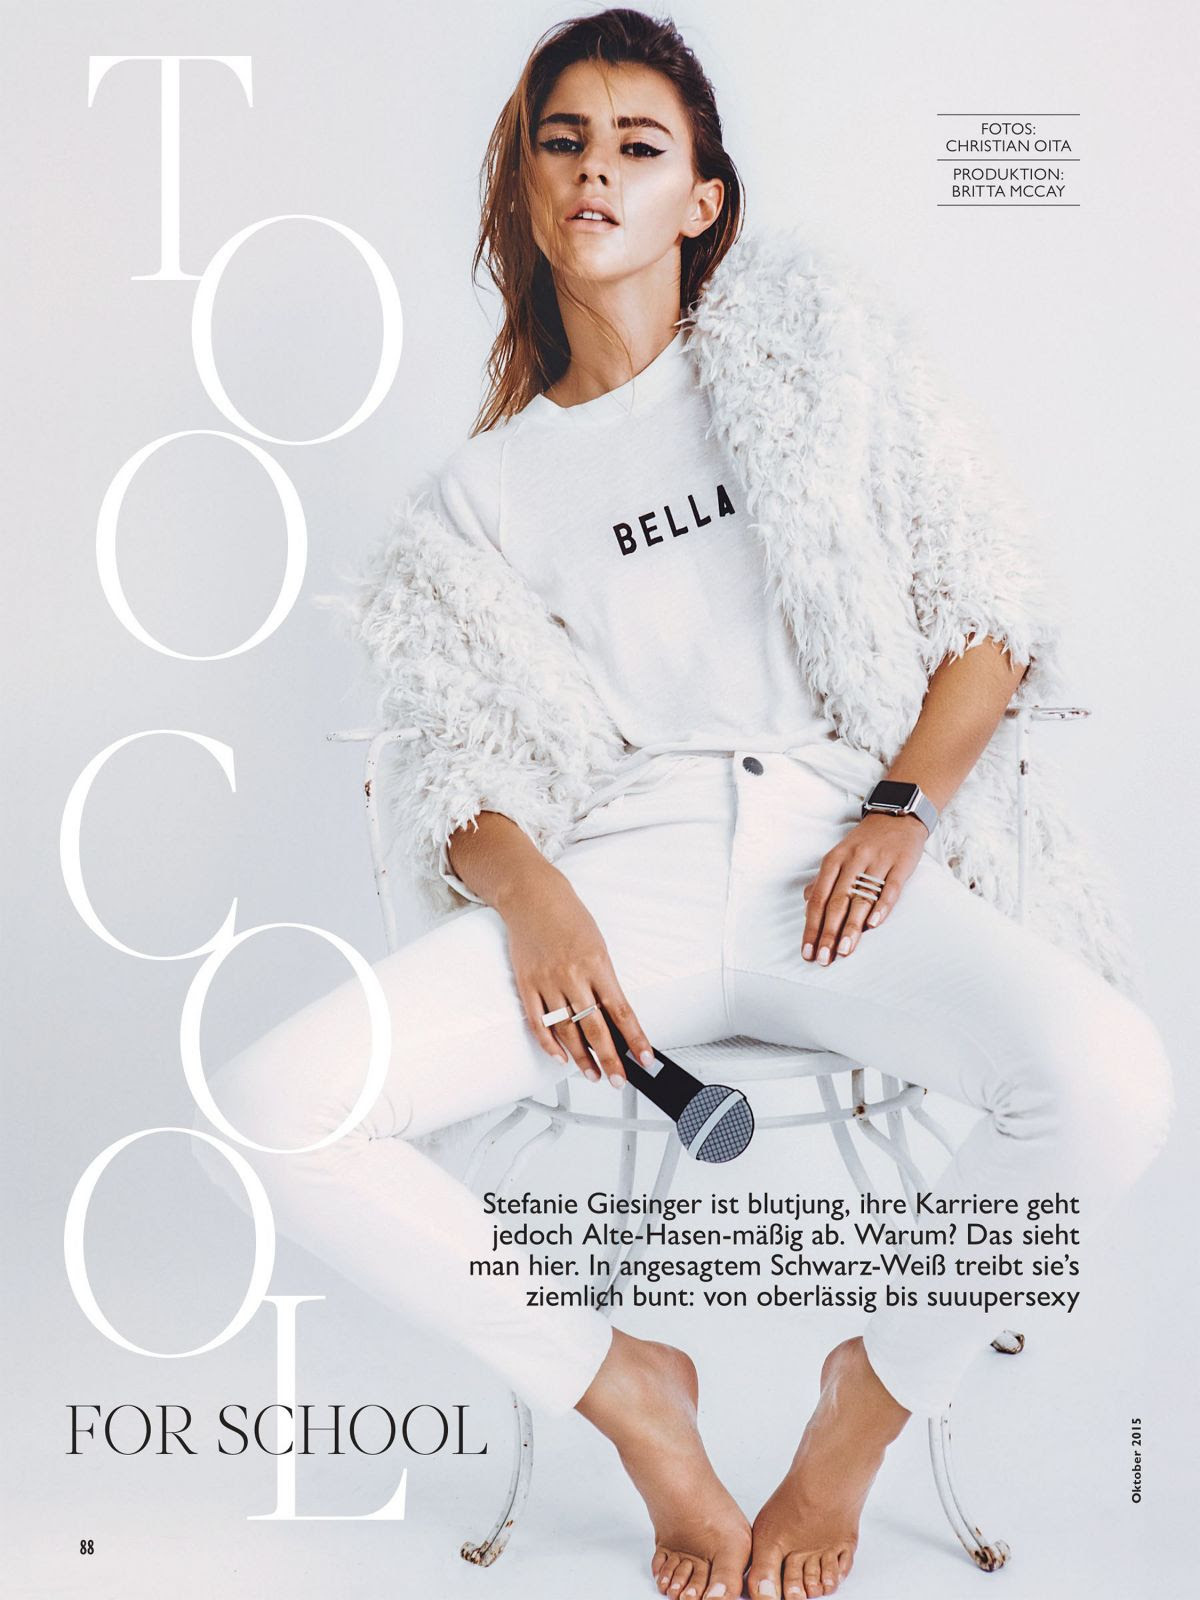 STEFANIE GIESINGER in Cosmopolitan Magazine, Germany October 2015 Issue